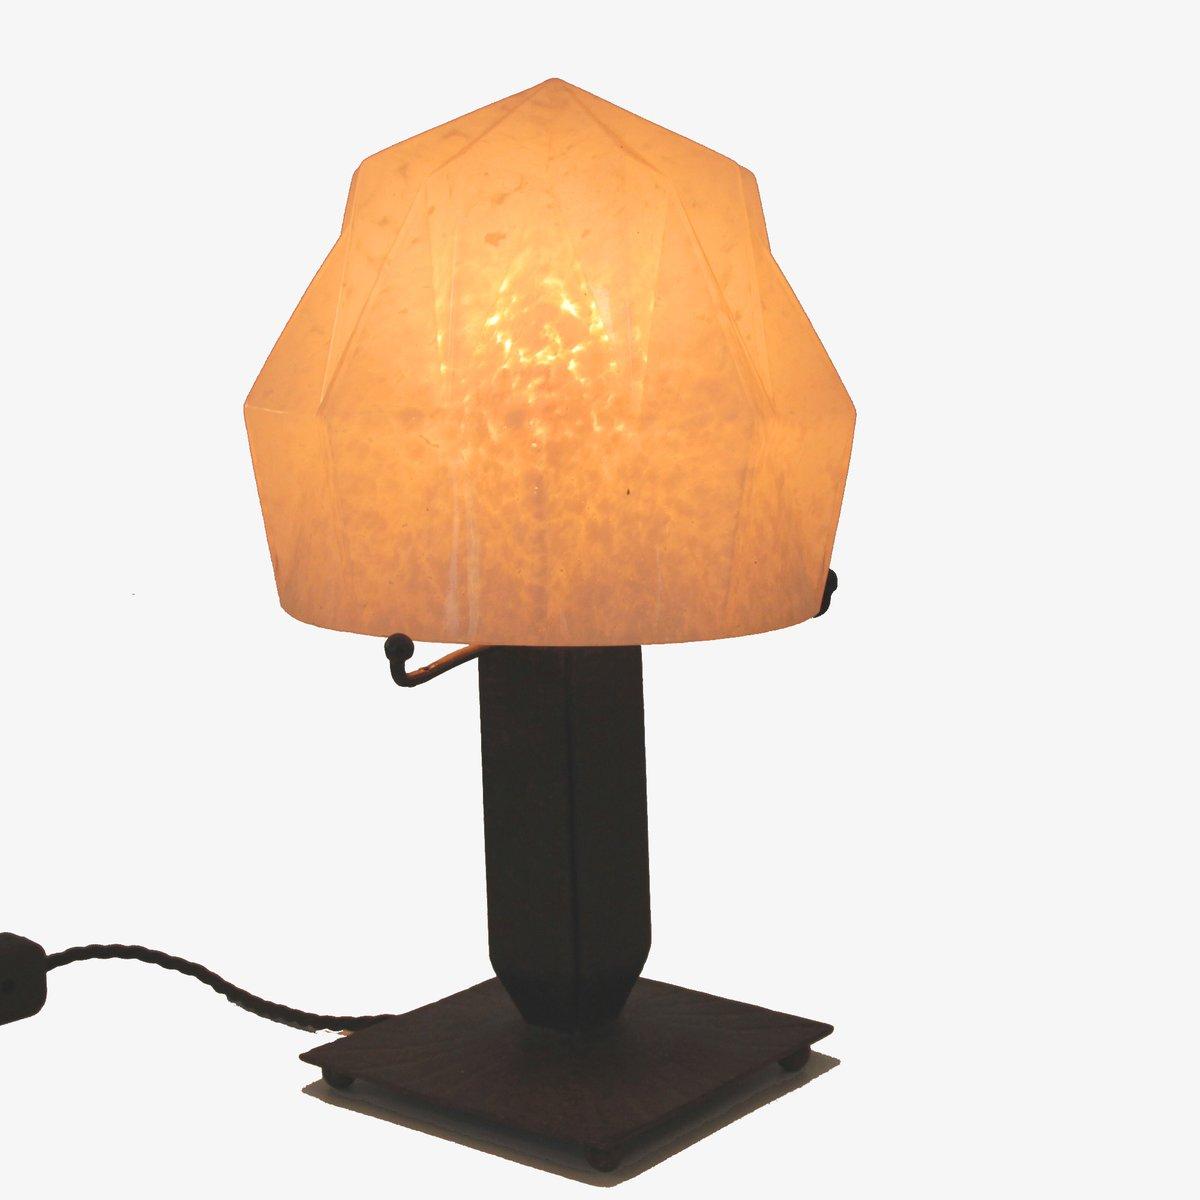 Lampe de bureau france 1930s en vente sur pamono - Lampe de bureau style anglais ...